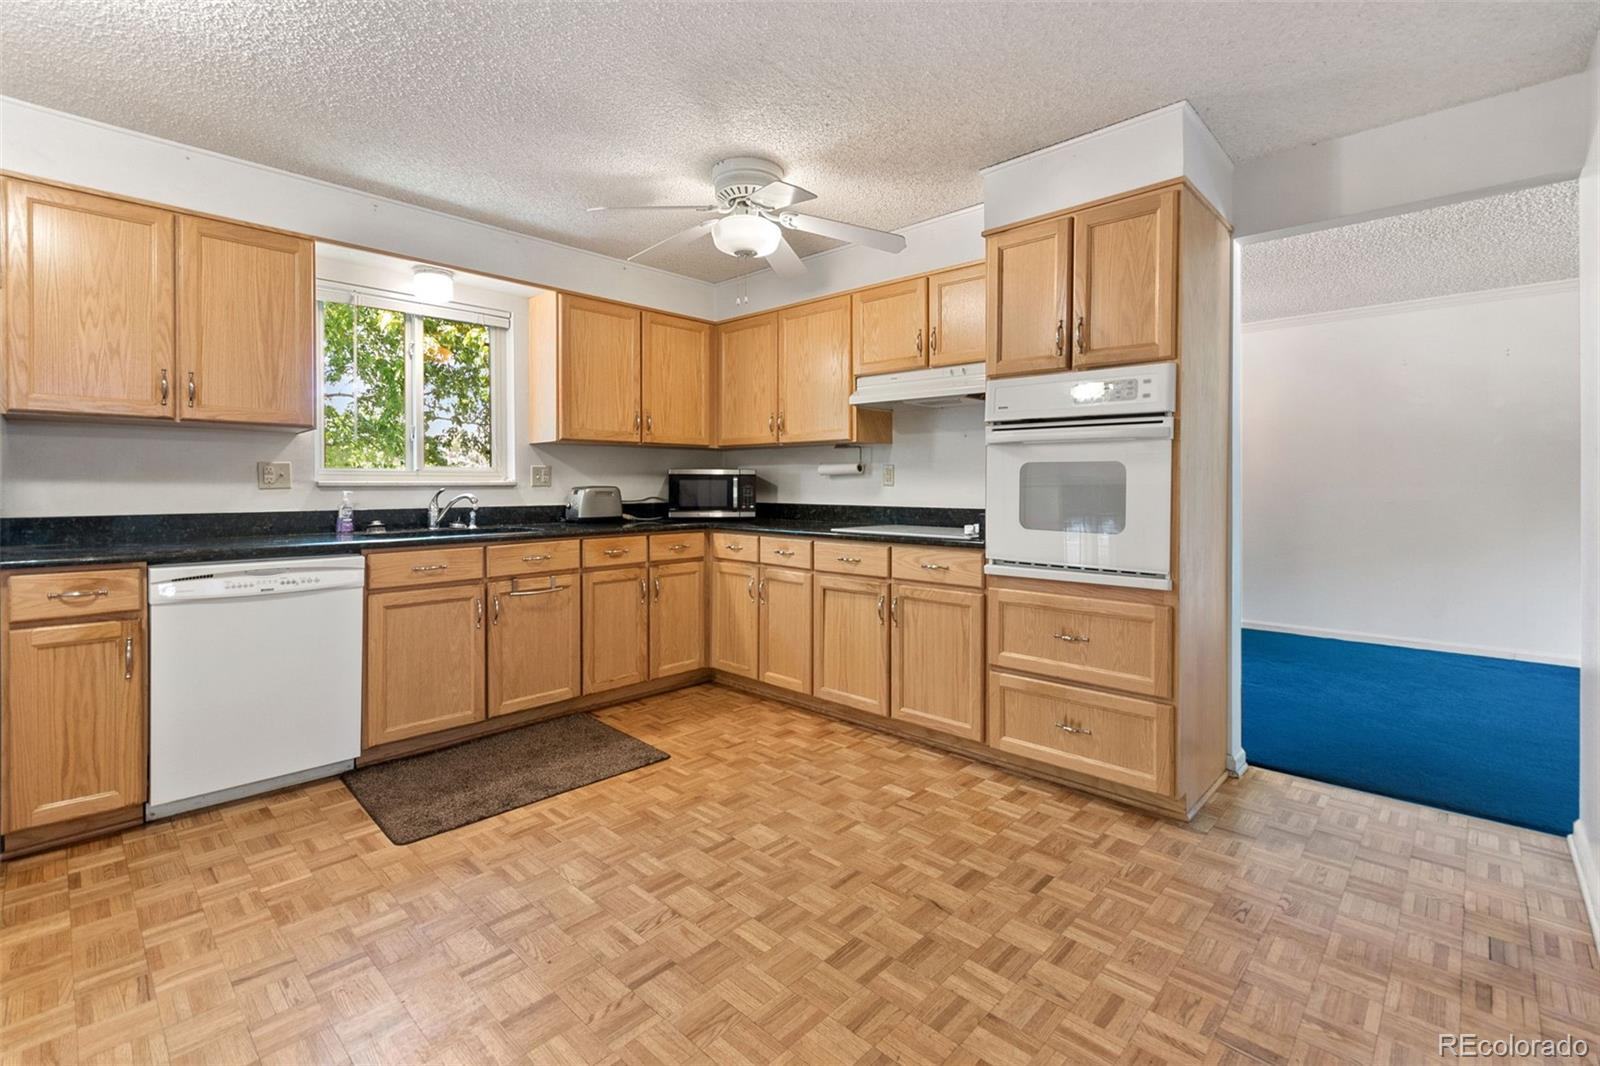 MLS# 7770404 - 10 - 2355 S Hoyt Street, Lakewood, CO 80227